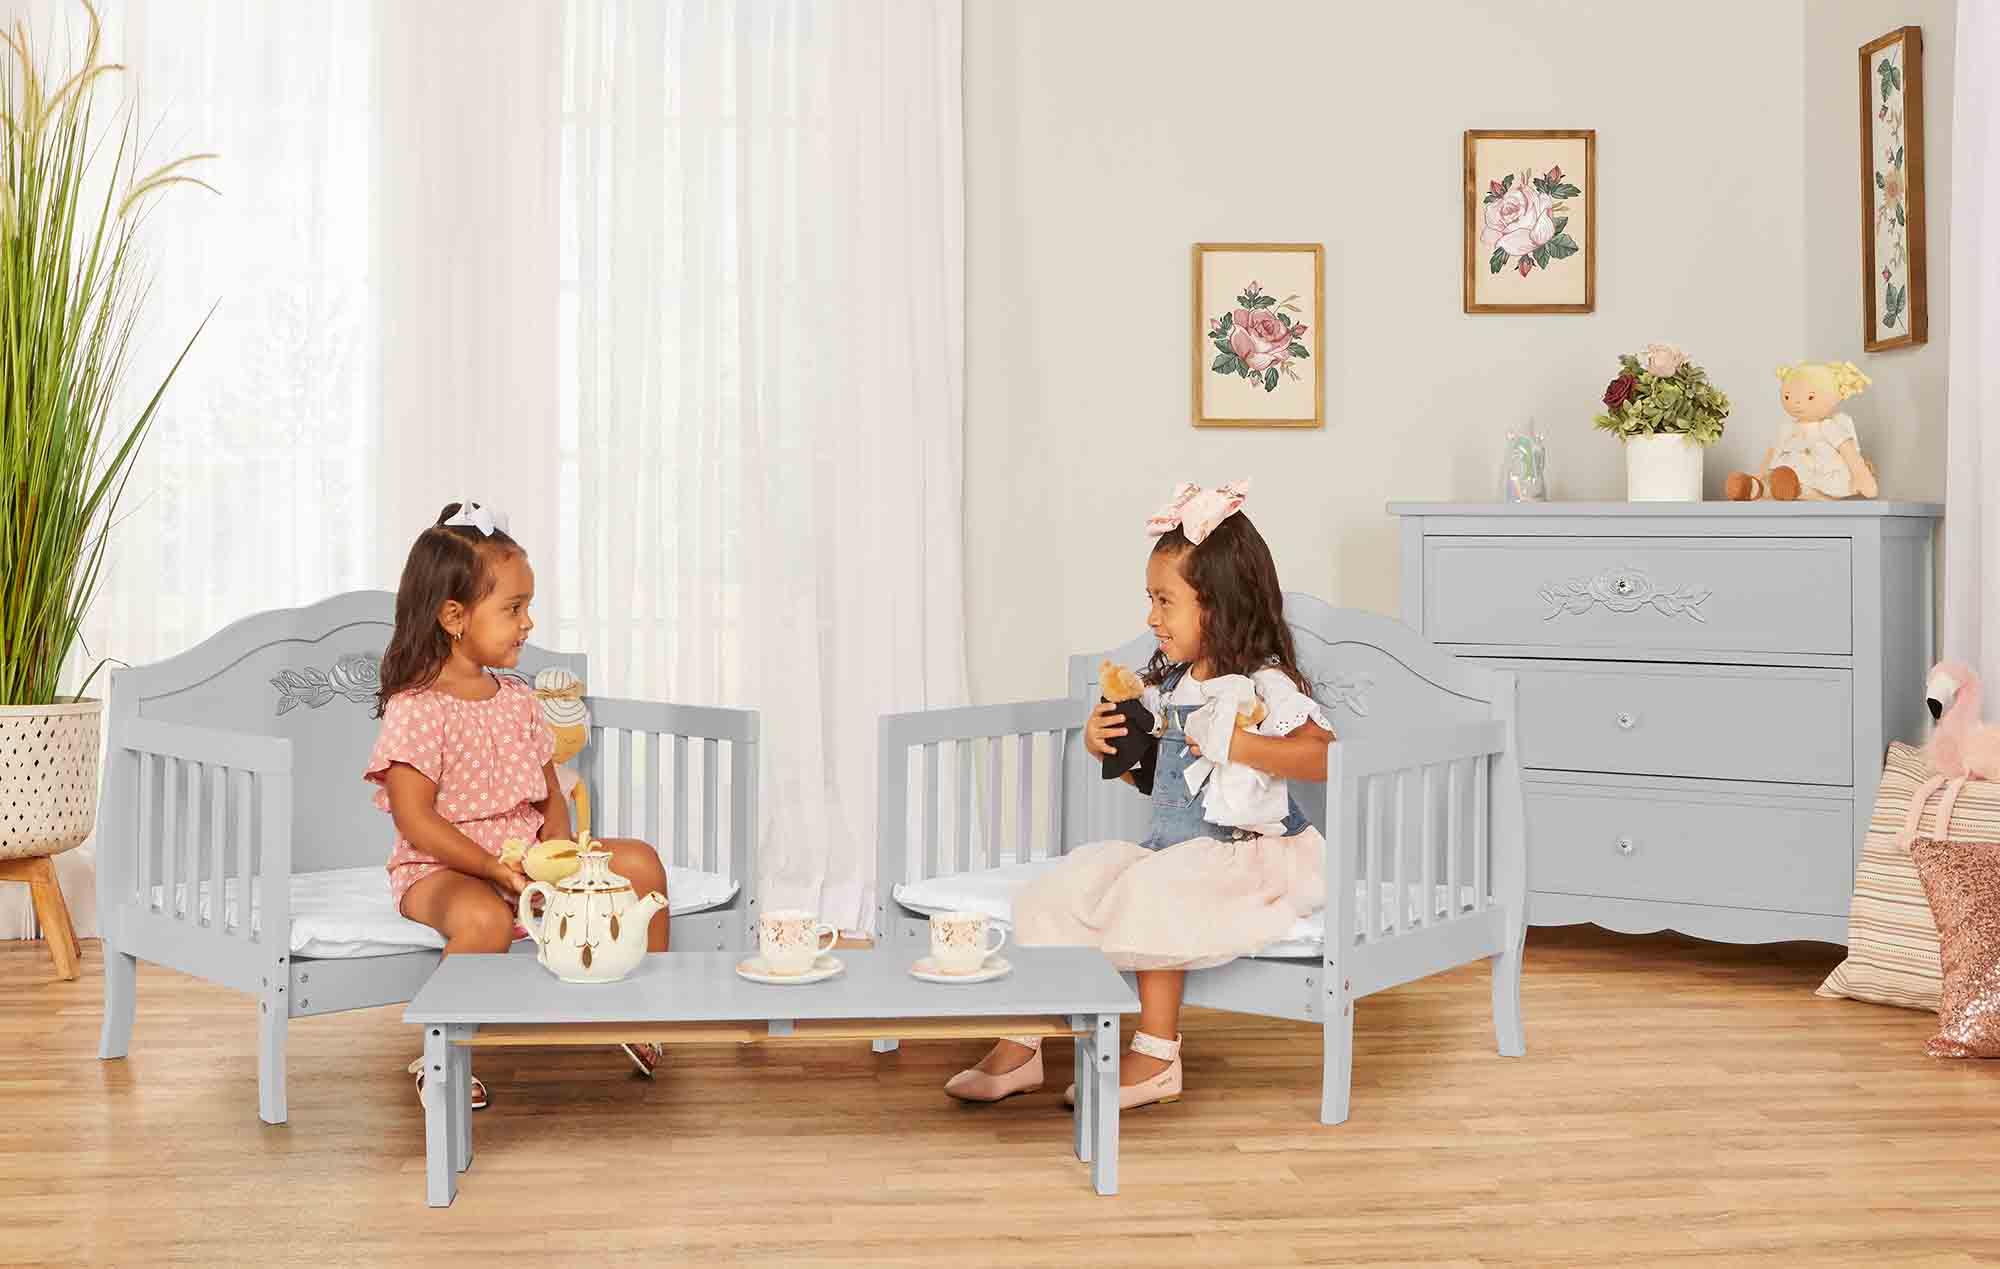 640_PLTM Rose Toddler Bed RmScene 03